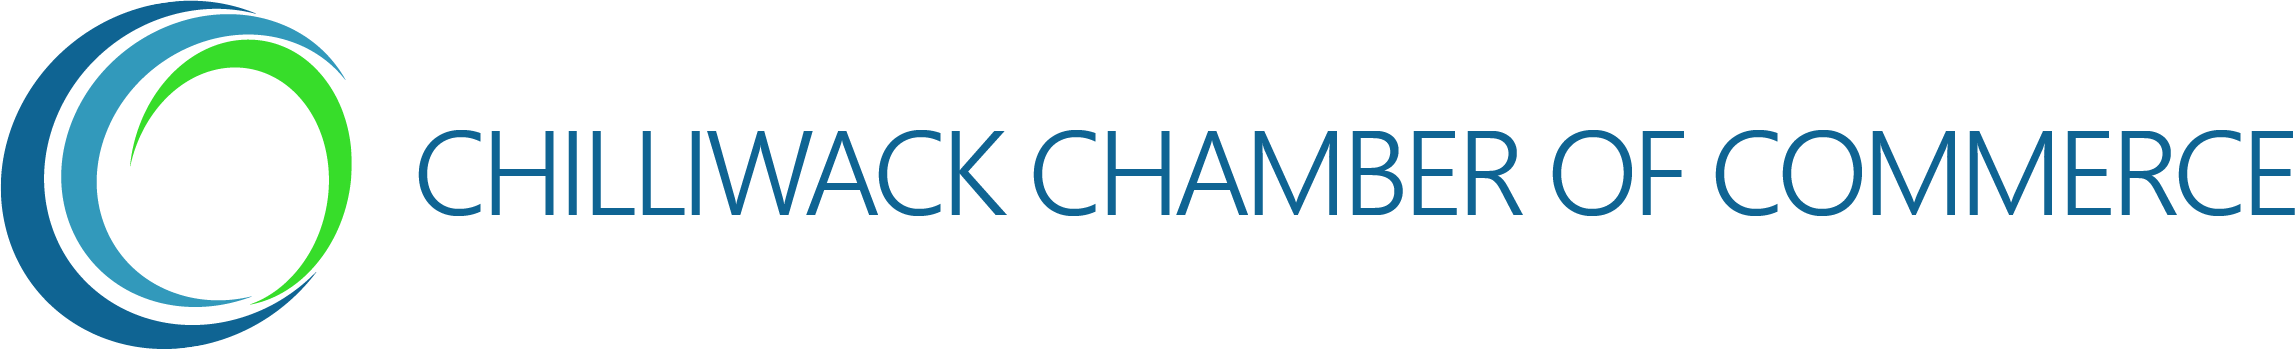 Chilliwack Chamber - Logo - Full Width.png